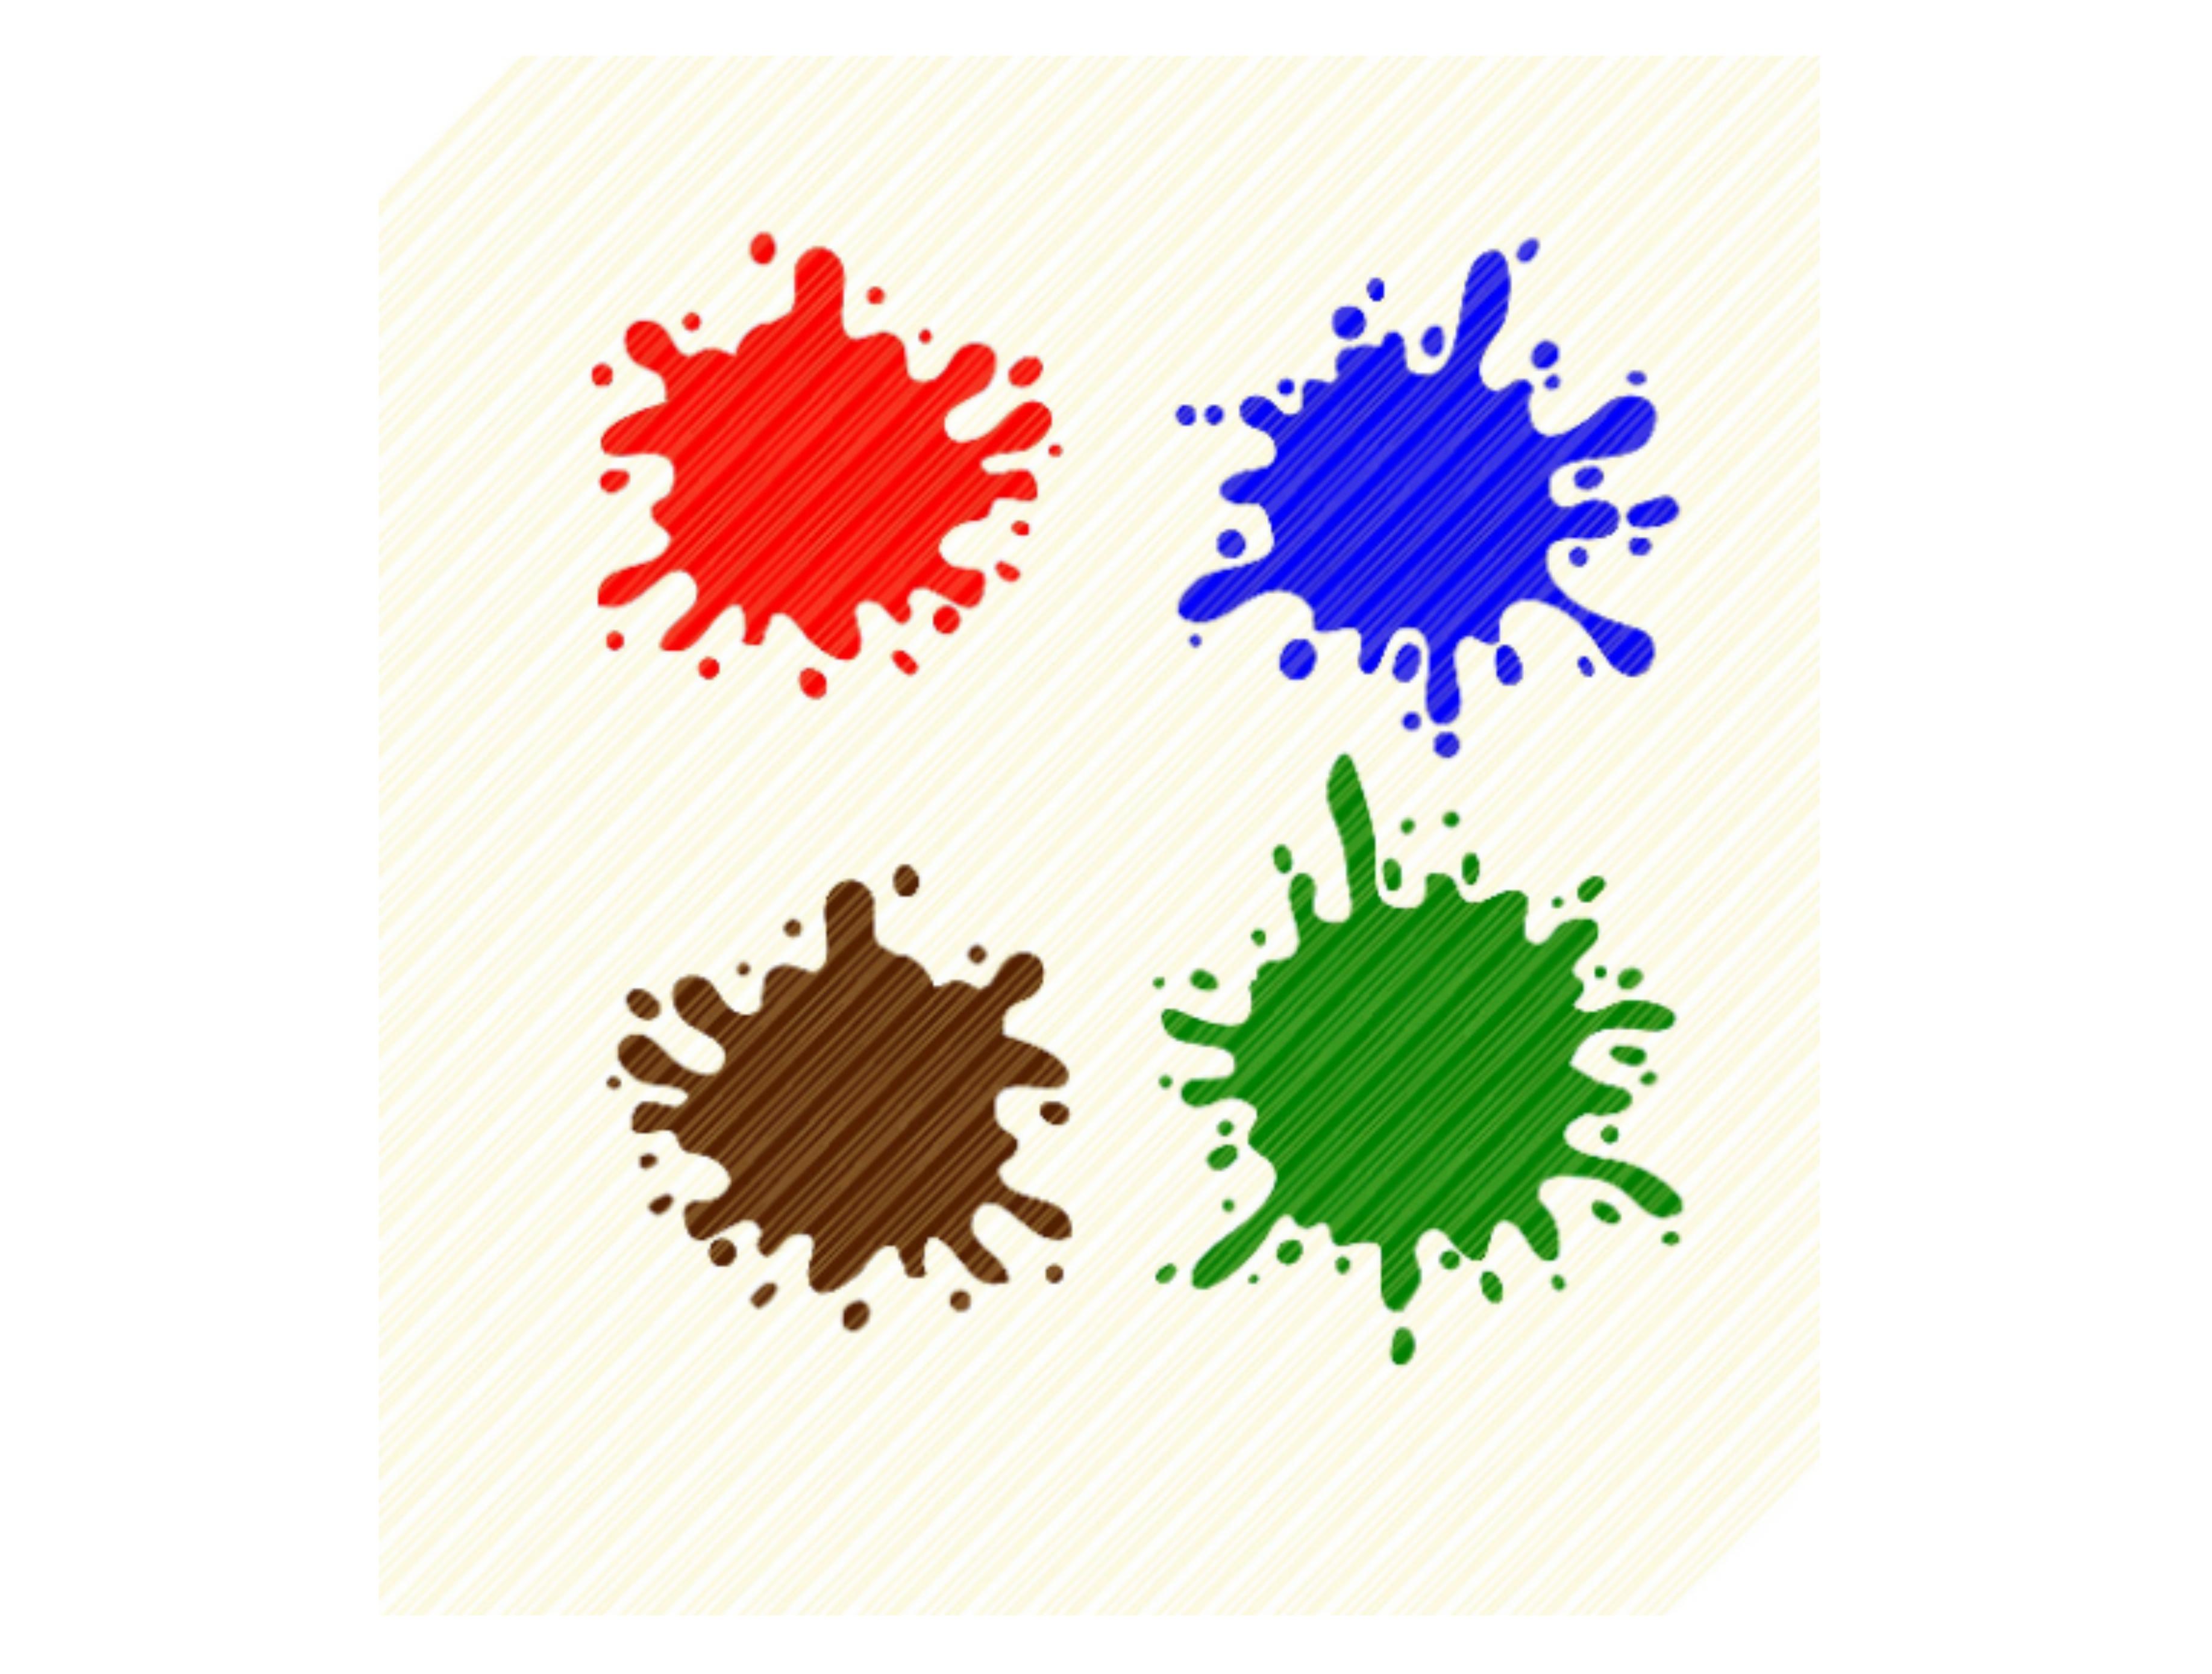 Paint Splatter Mud Splatter Splash Graphic By Svgplacedesign Creative Fabrica